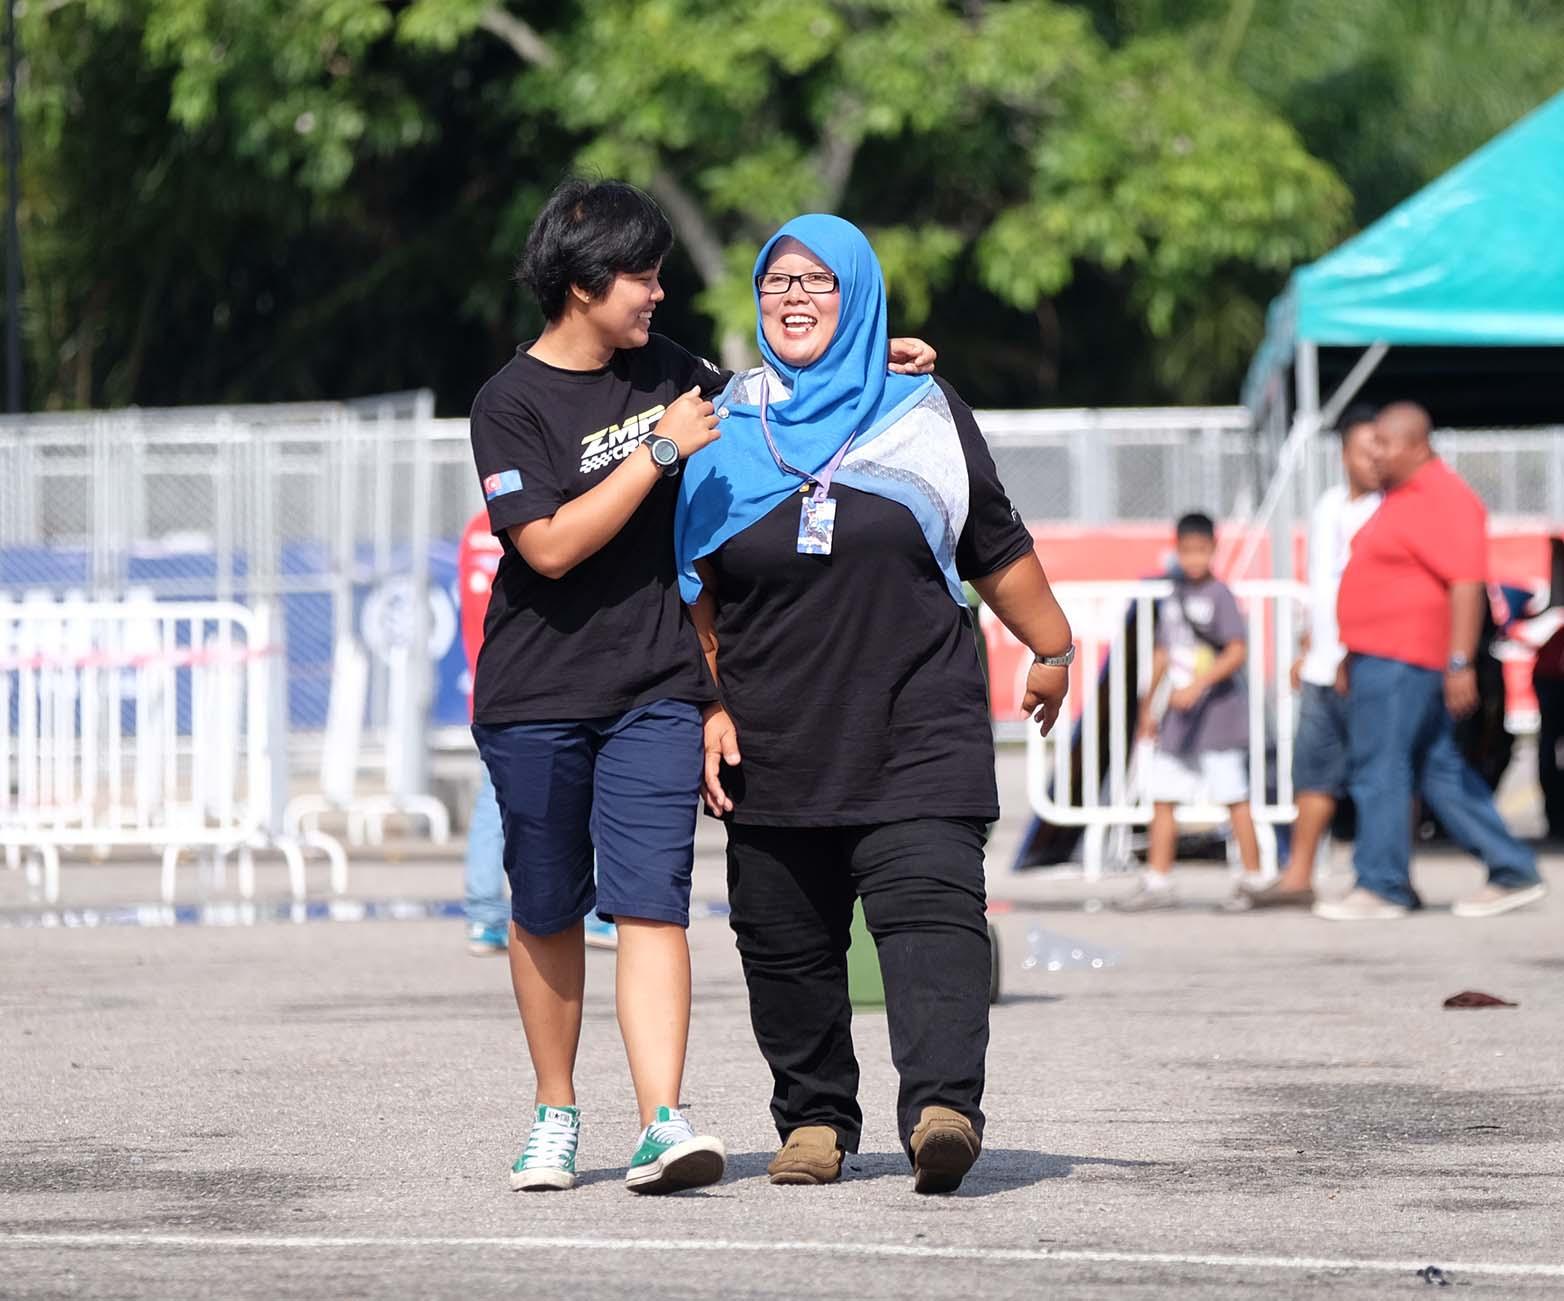 Fifie mendedikasikan perlumbaan pertama kepada wanita yang paling banyak menyokong perjalanan karier selama ini, ibunya sendiri, Norwaini Hj Zuginin.